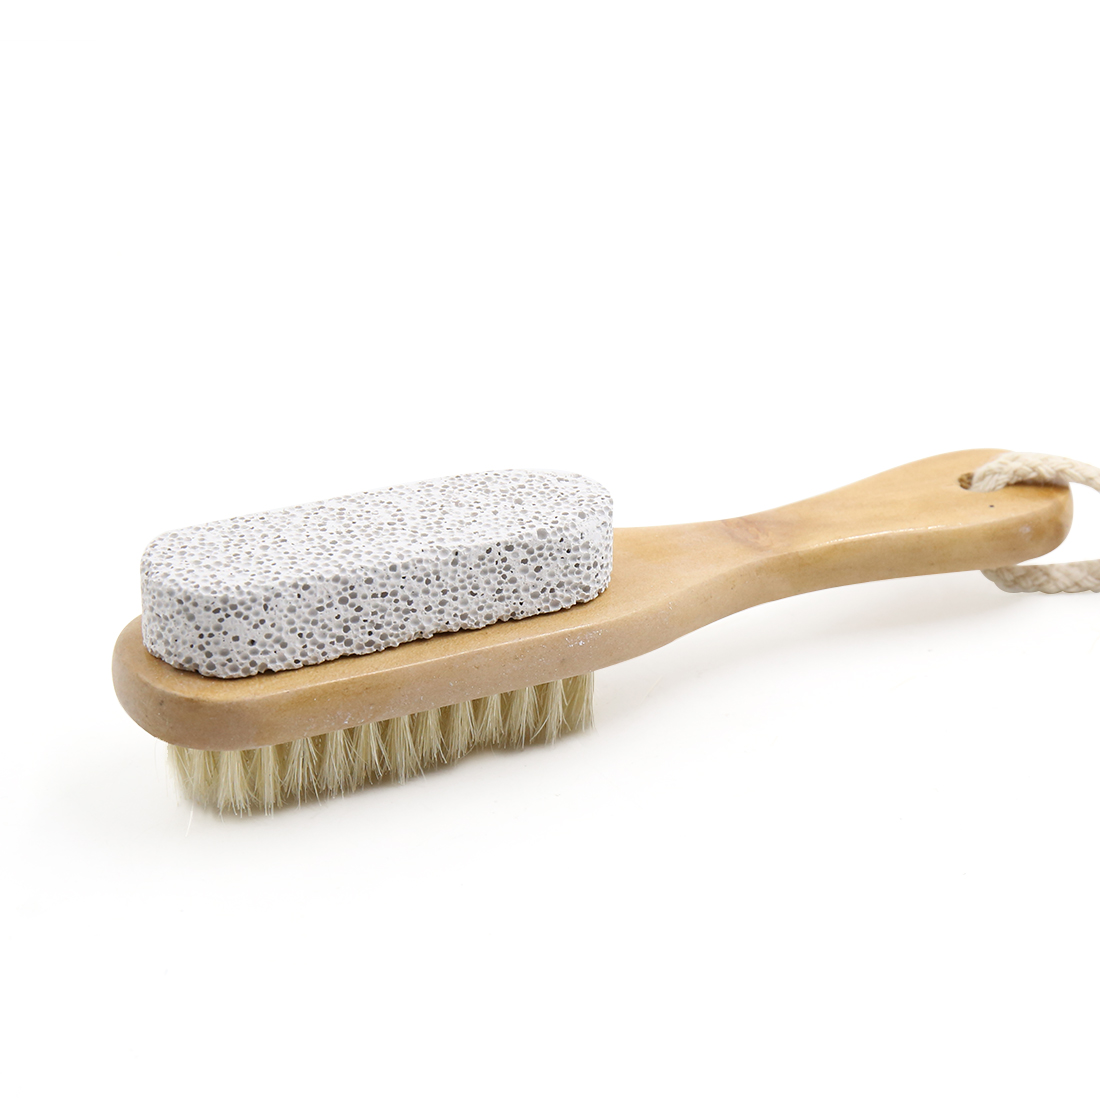 Pumice Bristle Wood Handle Foot Care Pedicure Calluses Dry Hard Dead Skin Exfoliates Brush Remover Scrubber